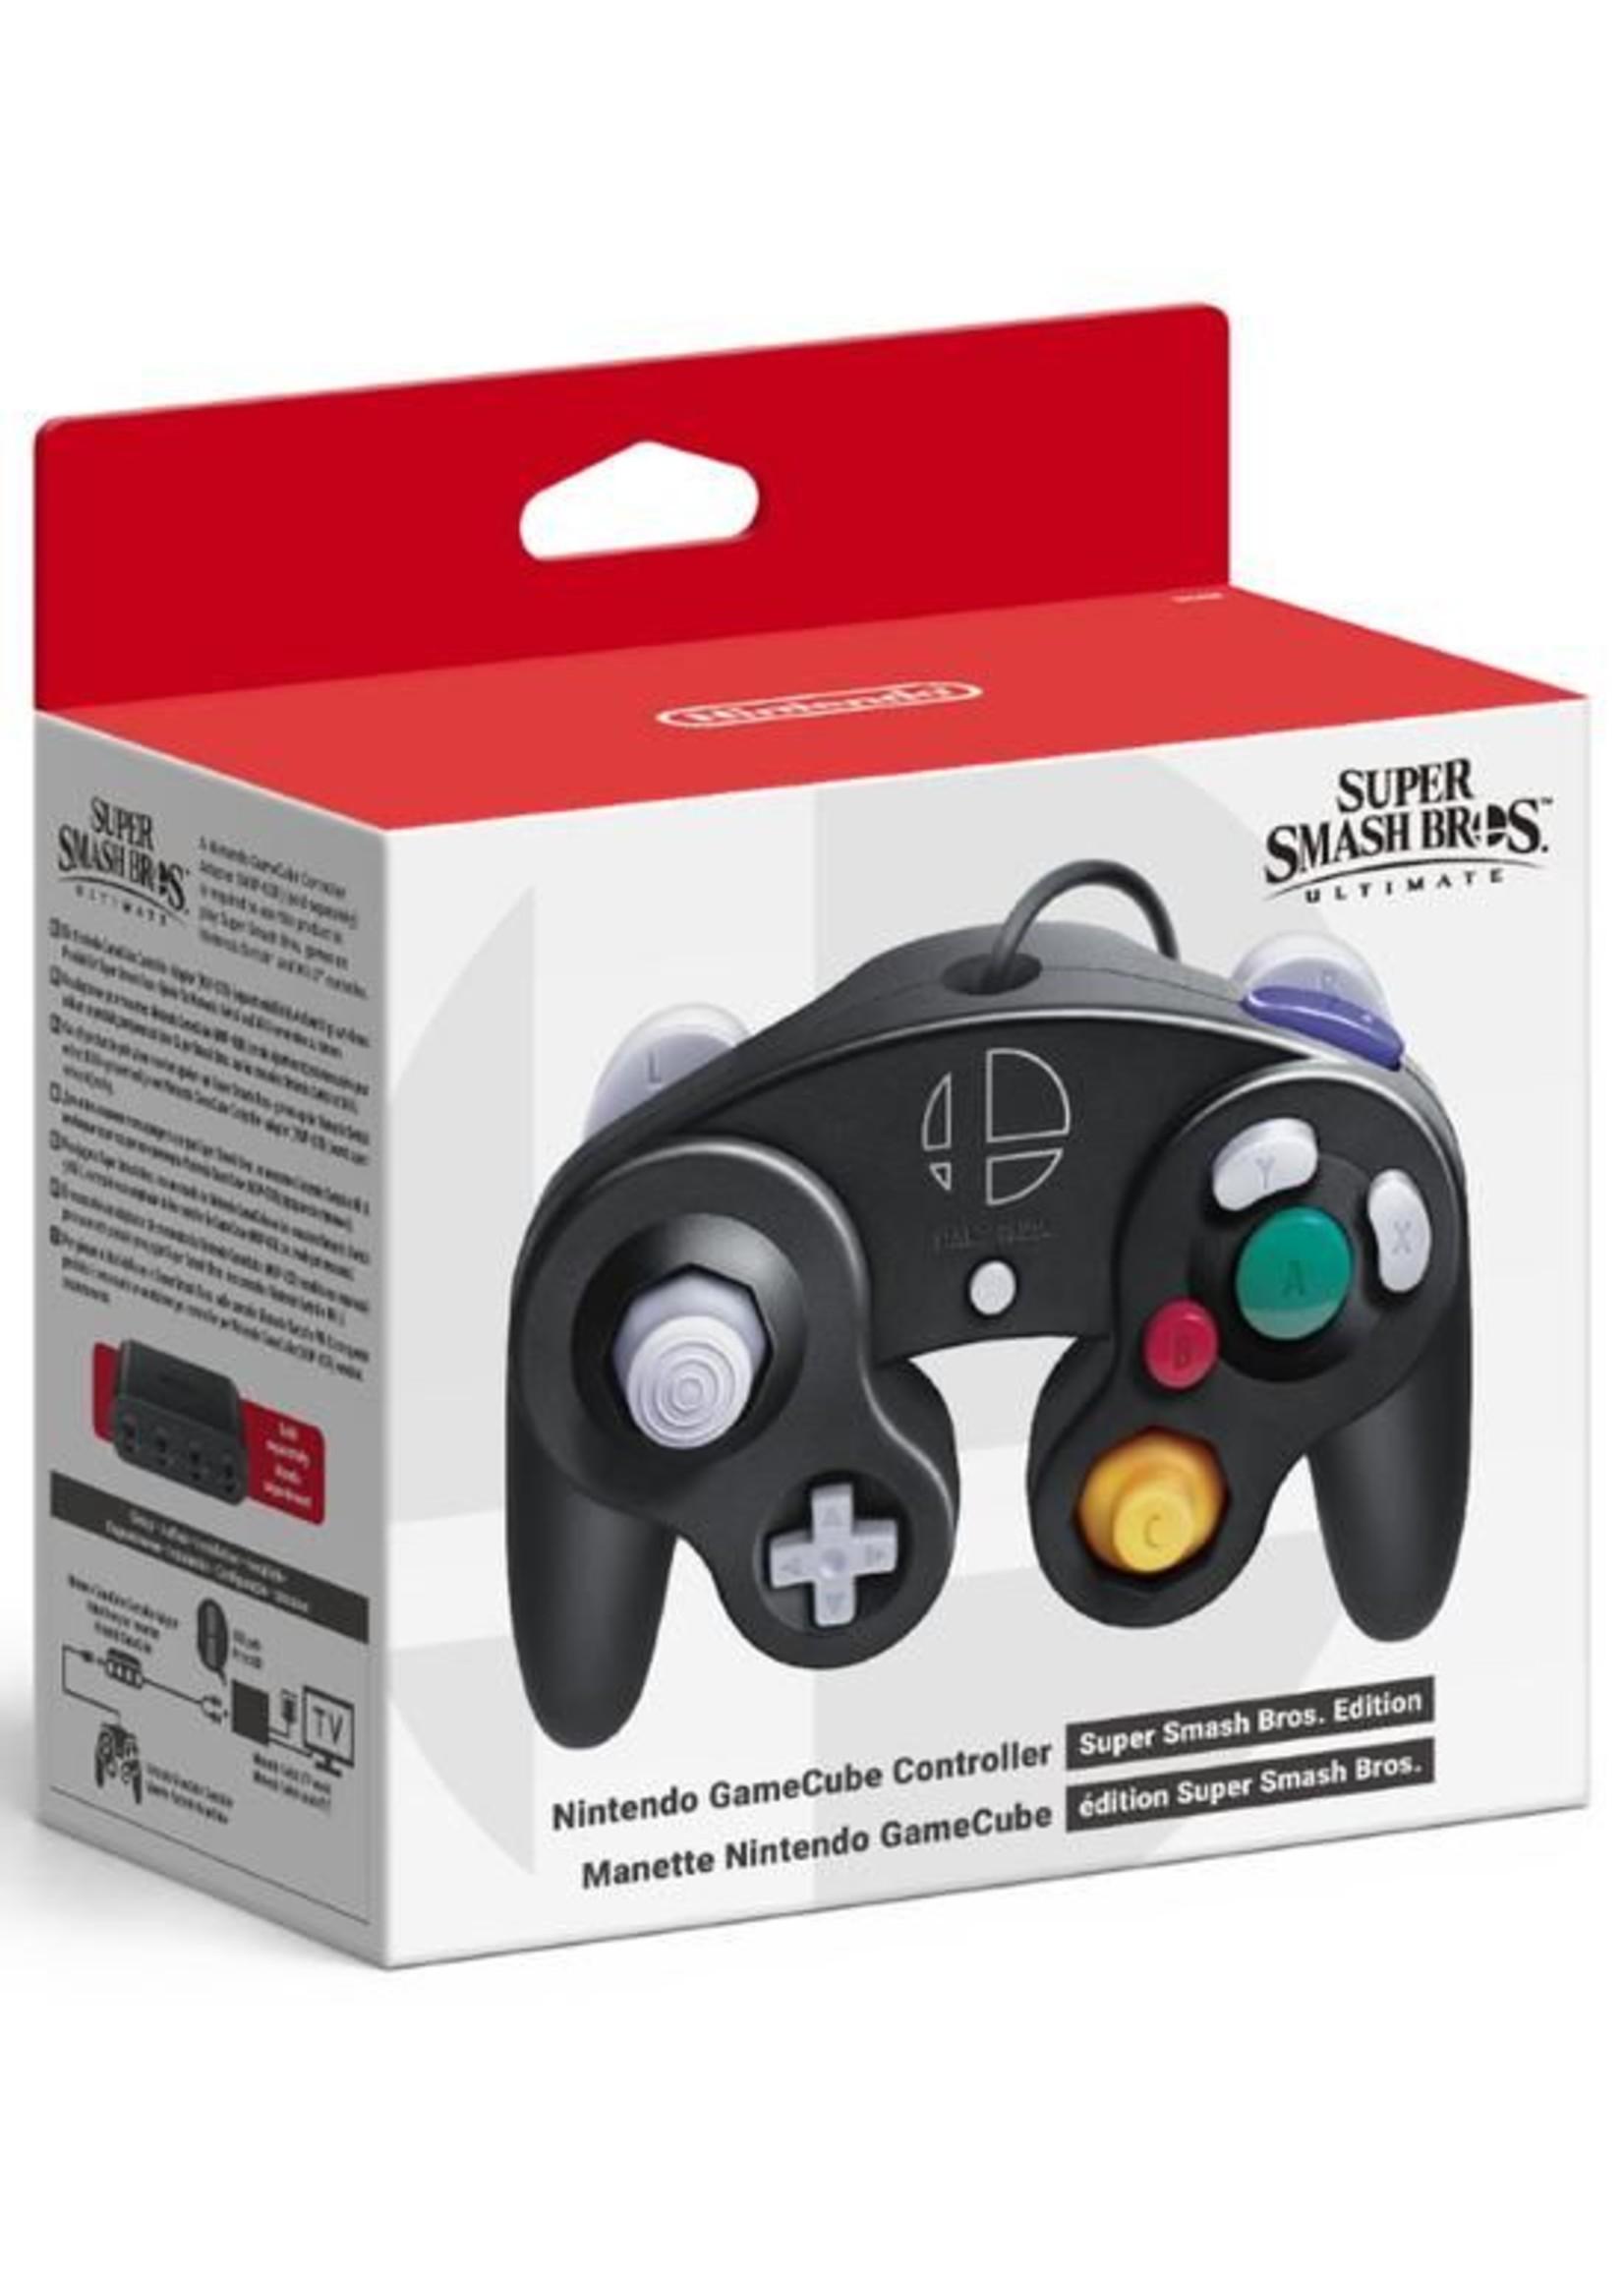 Nintendo GameCube Controller Super Smash Bros. Ultimate Edition